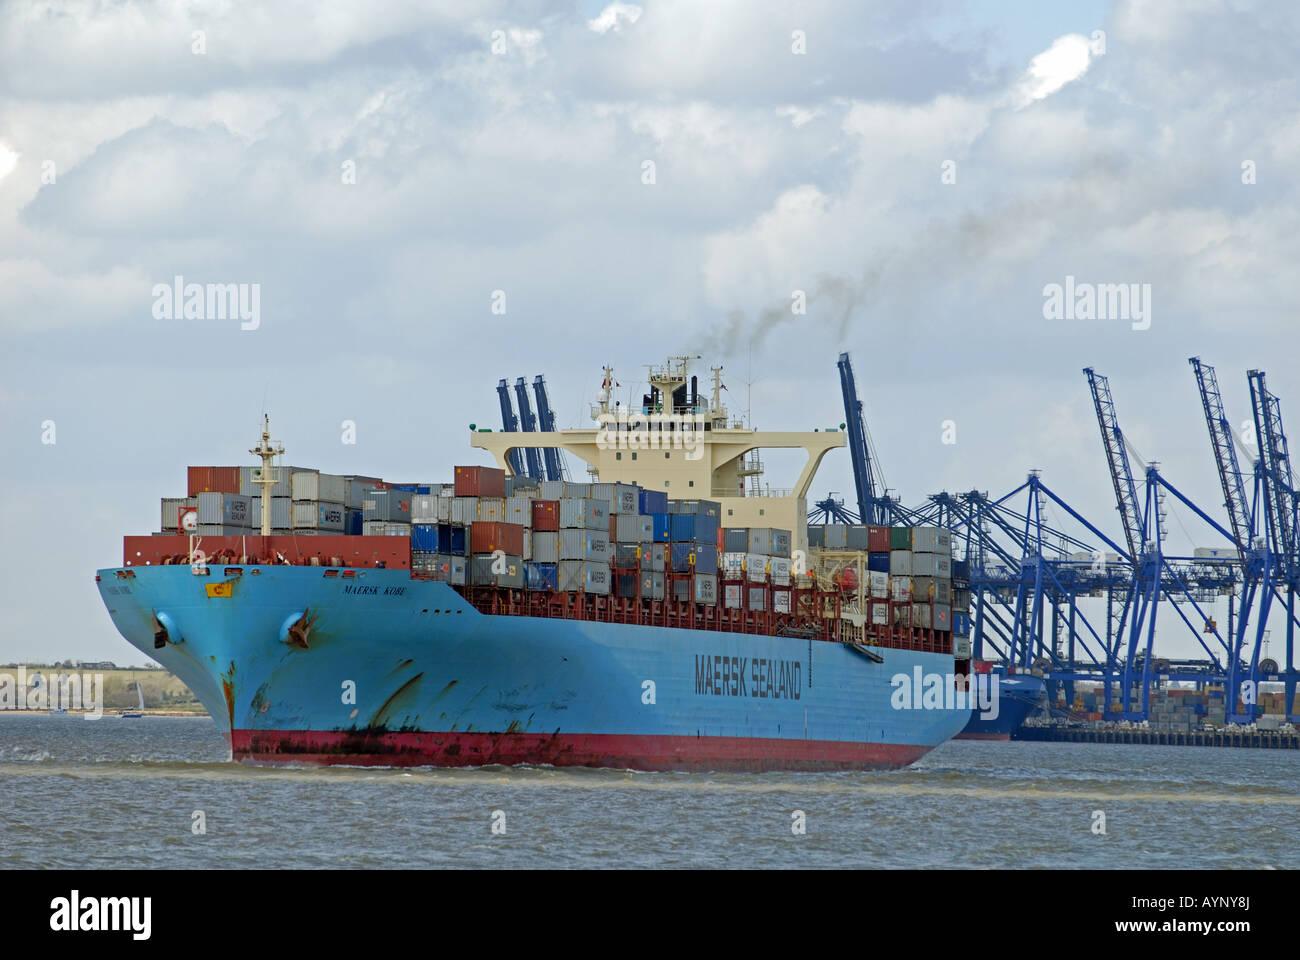 Maersk 'Kobe' container ship, Port of Felixstowe, Suffolk, UK. - Stock Image